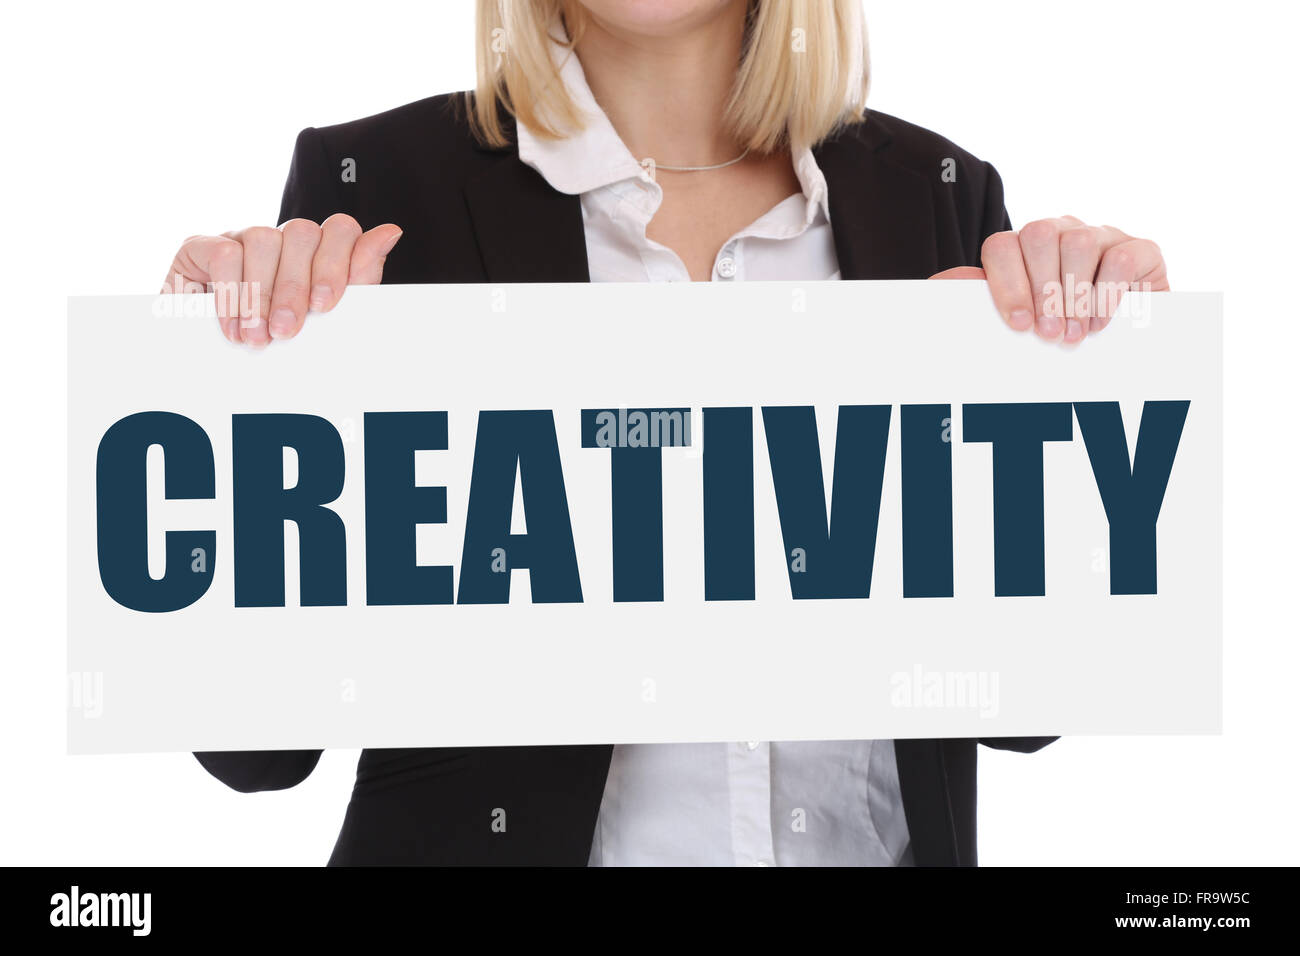 Creativity creative imagine imagination thinking ideas success successful business concept inspiration - Stock Image